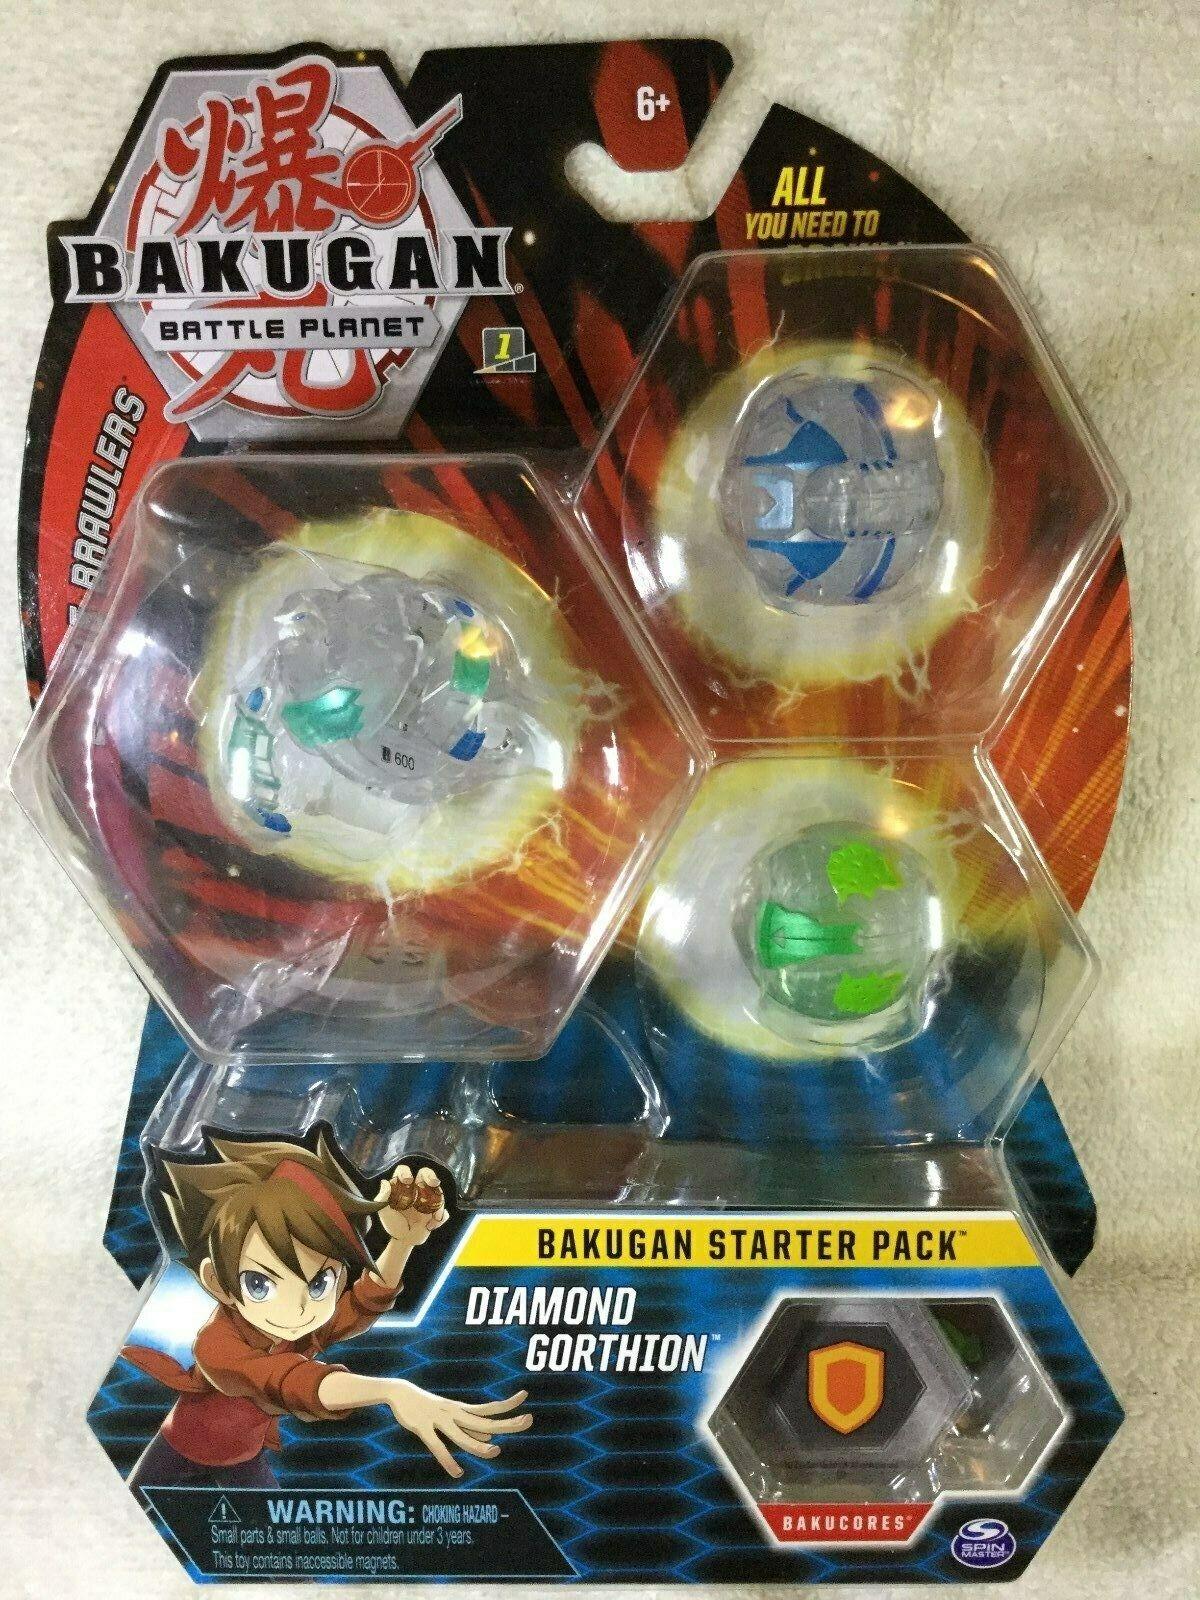 BAKUGAN estrellaTER PACK Diamond gorthion Set SPIN MASTER MOC battaglia pianeti Chase